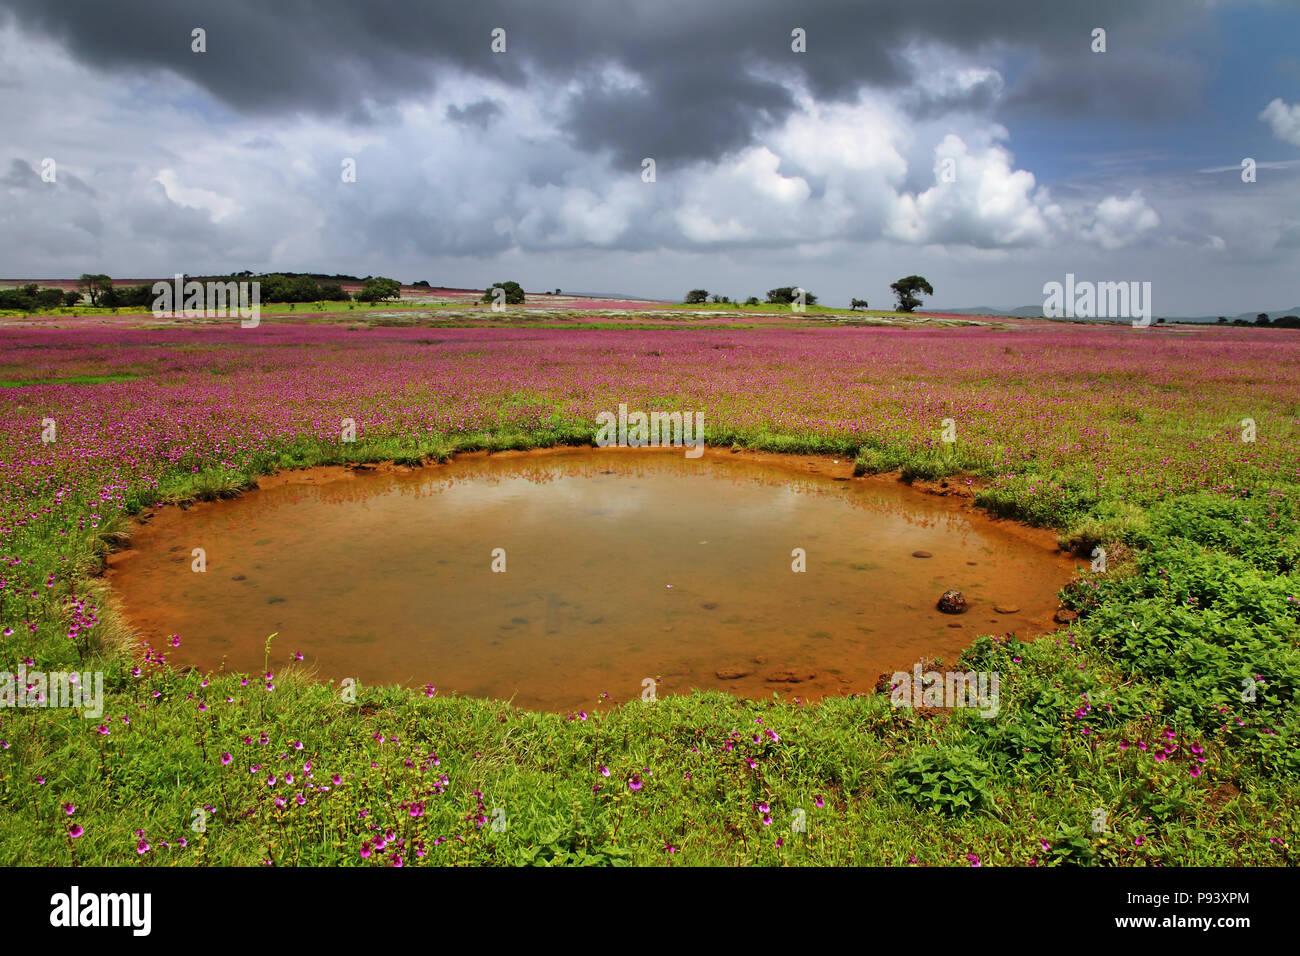 Kaas plateau of flowers in Satara district Western Ghats Maharastra, India - Stock Image